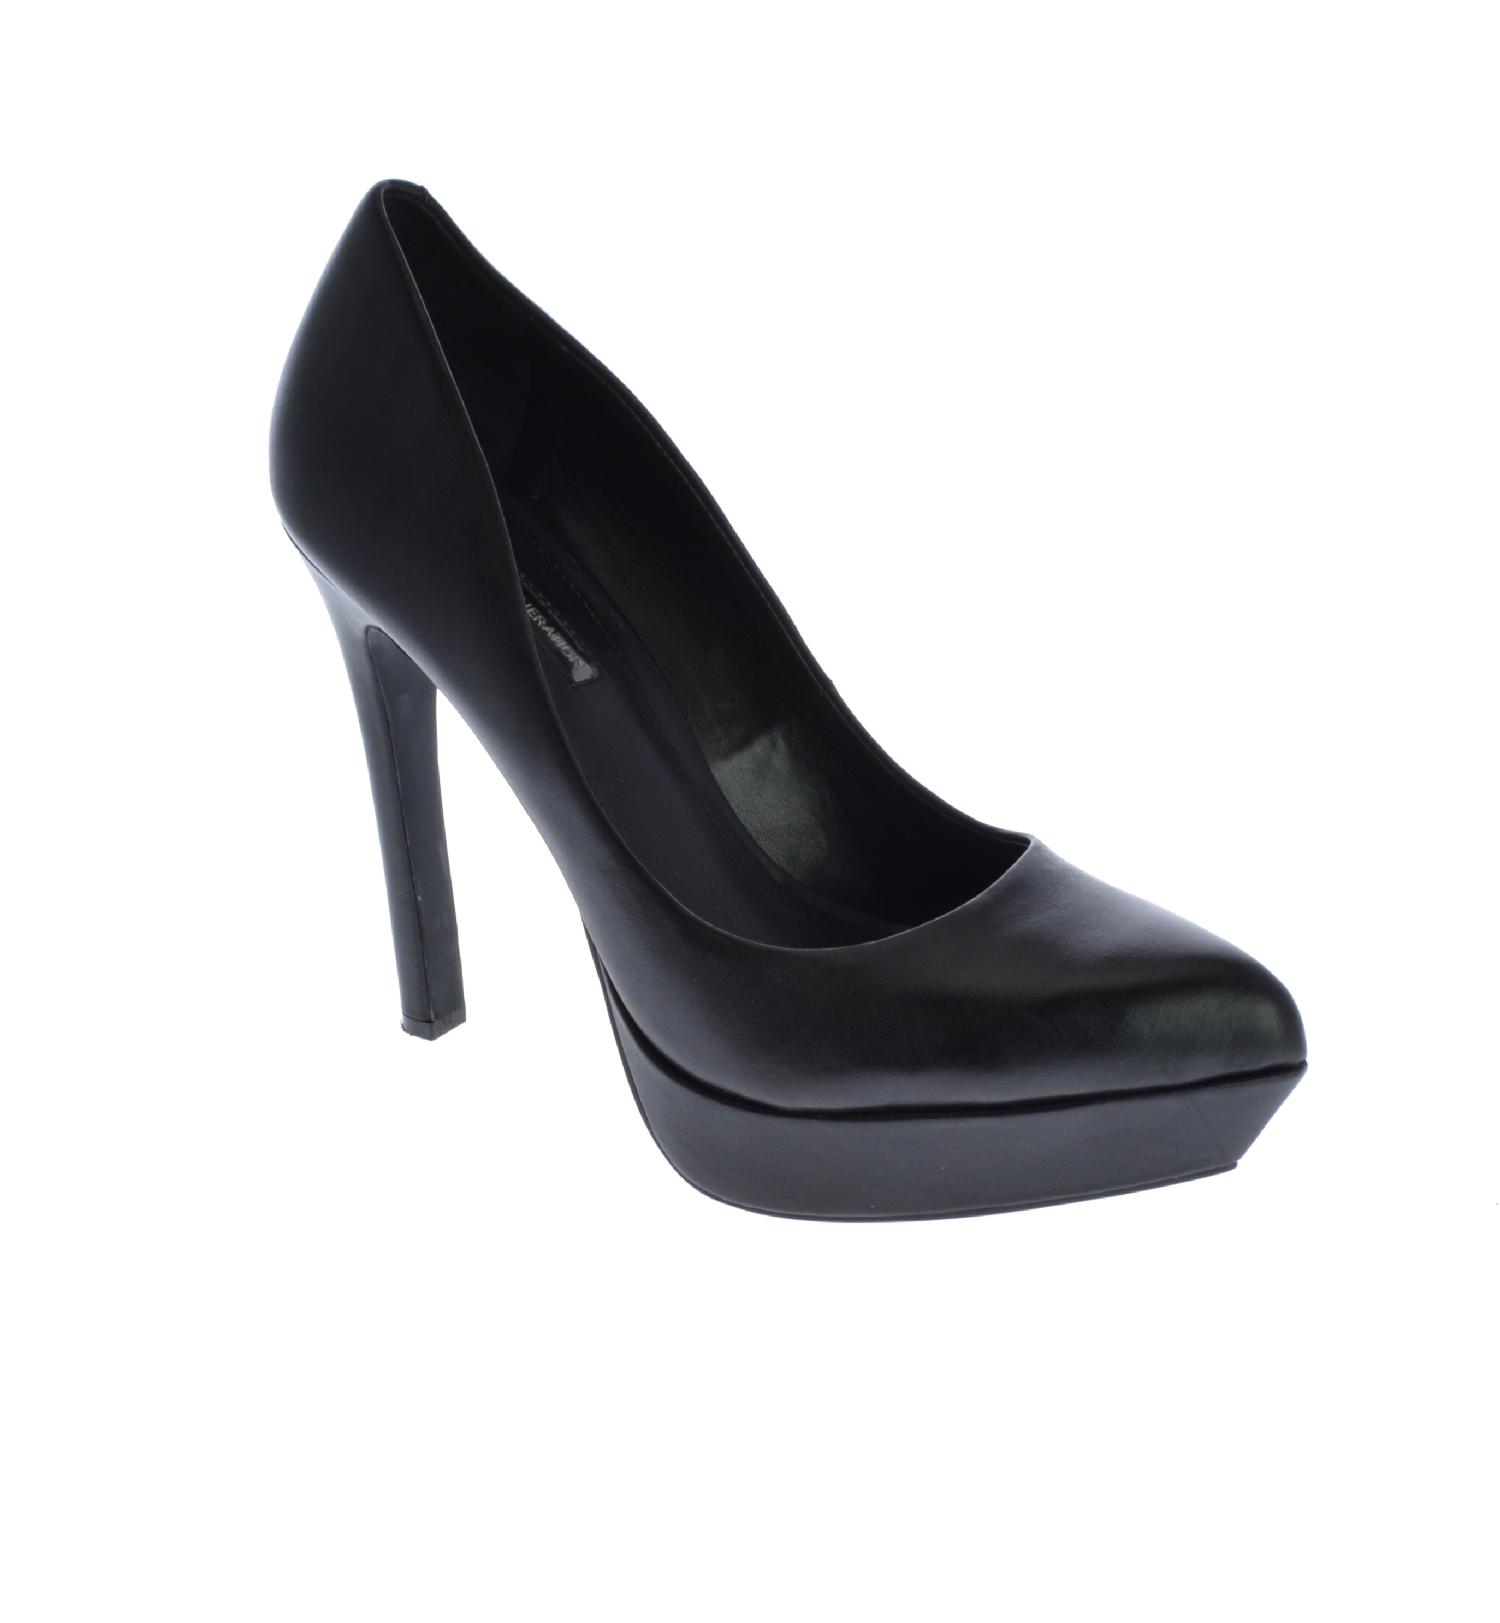 BCBGeneration-Sochi-Womens-Size-8-5-Black-Leather-High-Heel-Platforms-EU-38-5